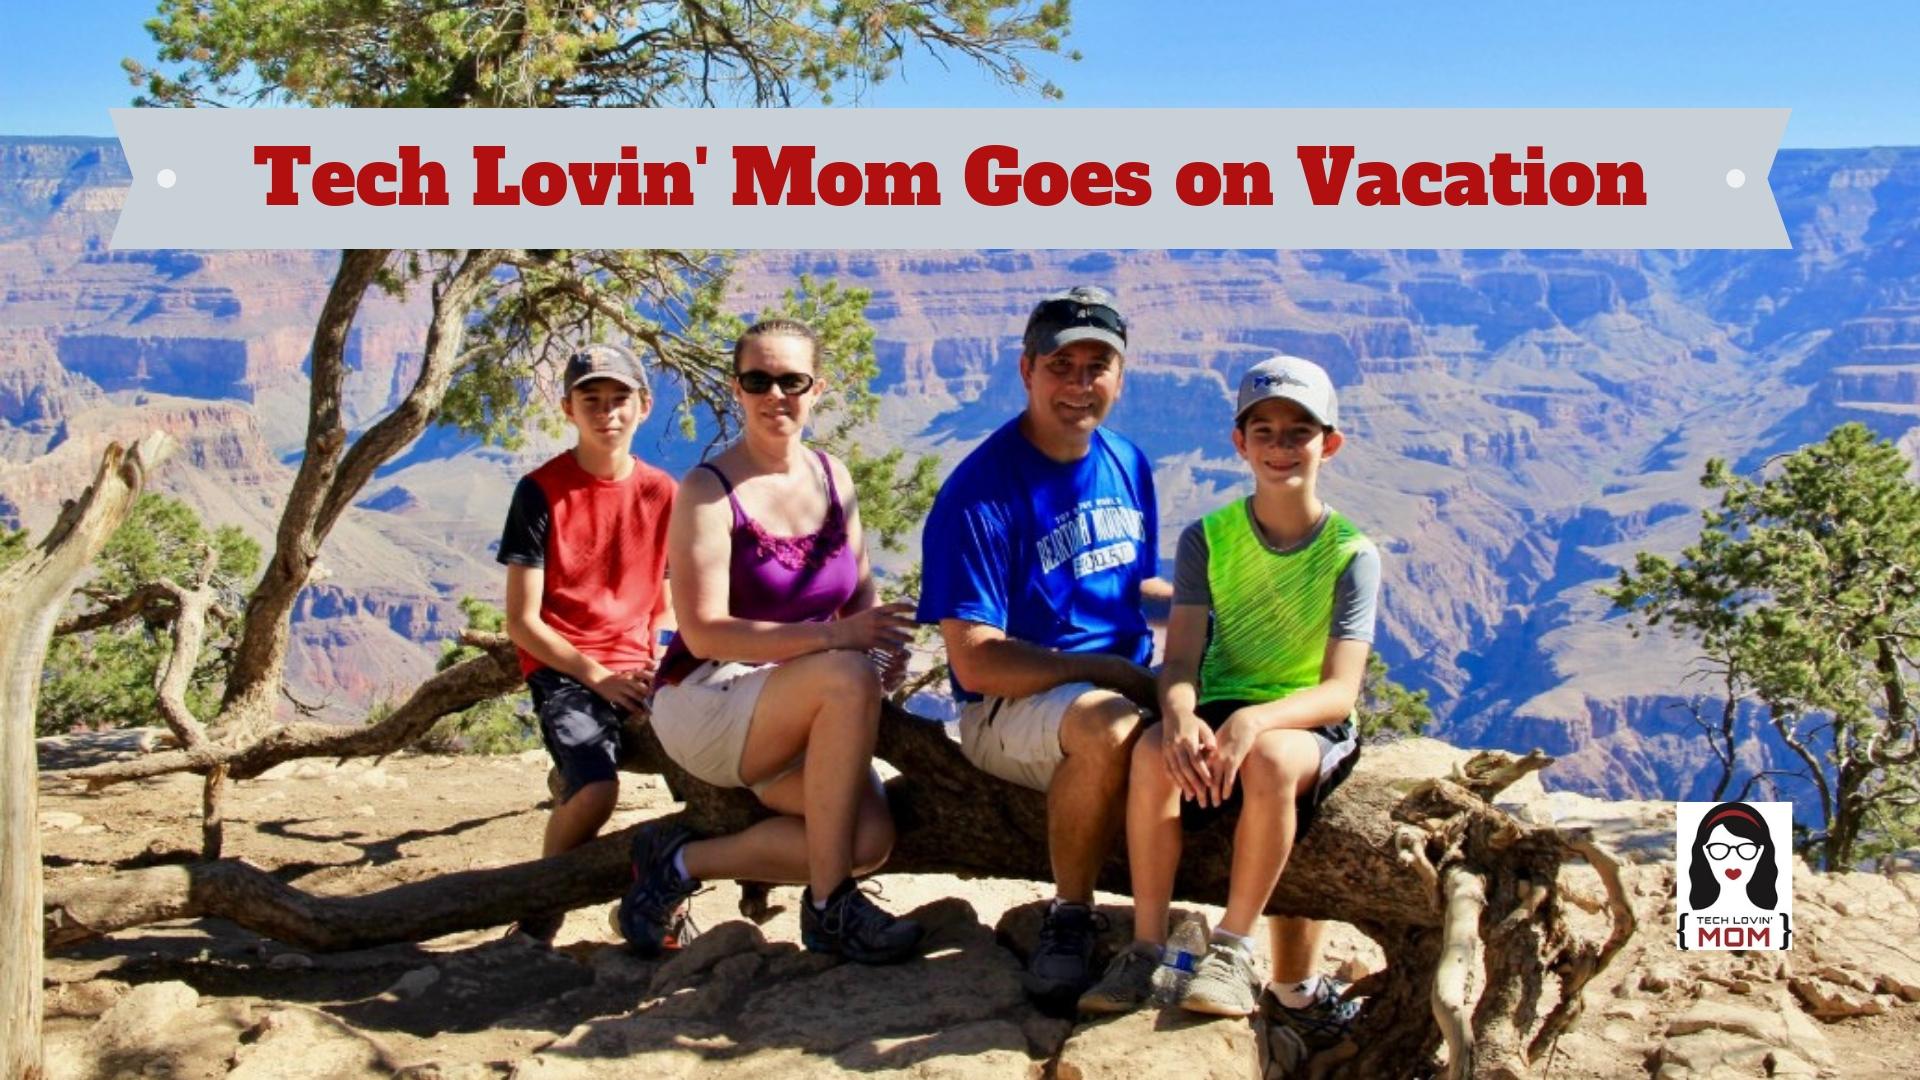 Tech Lovin' Mom Goes on Vacation